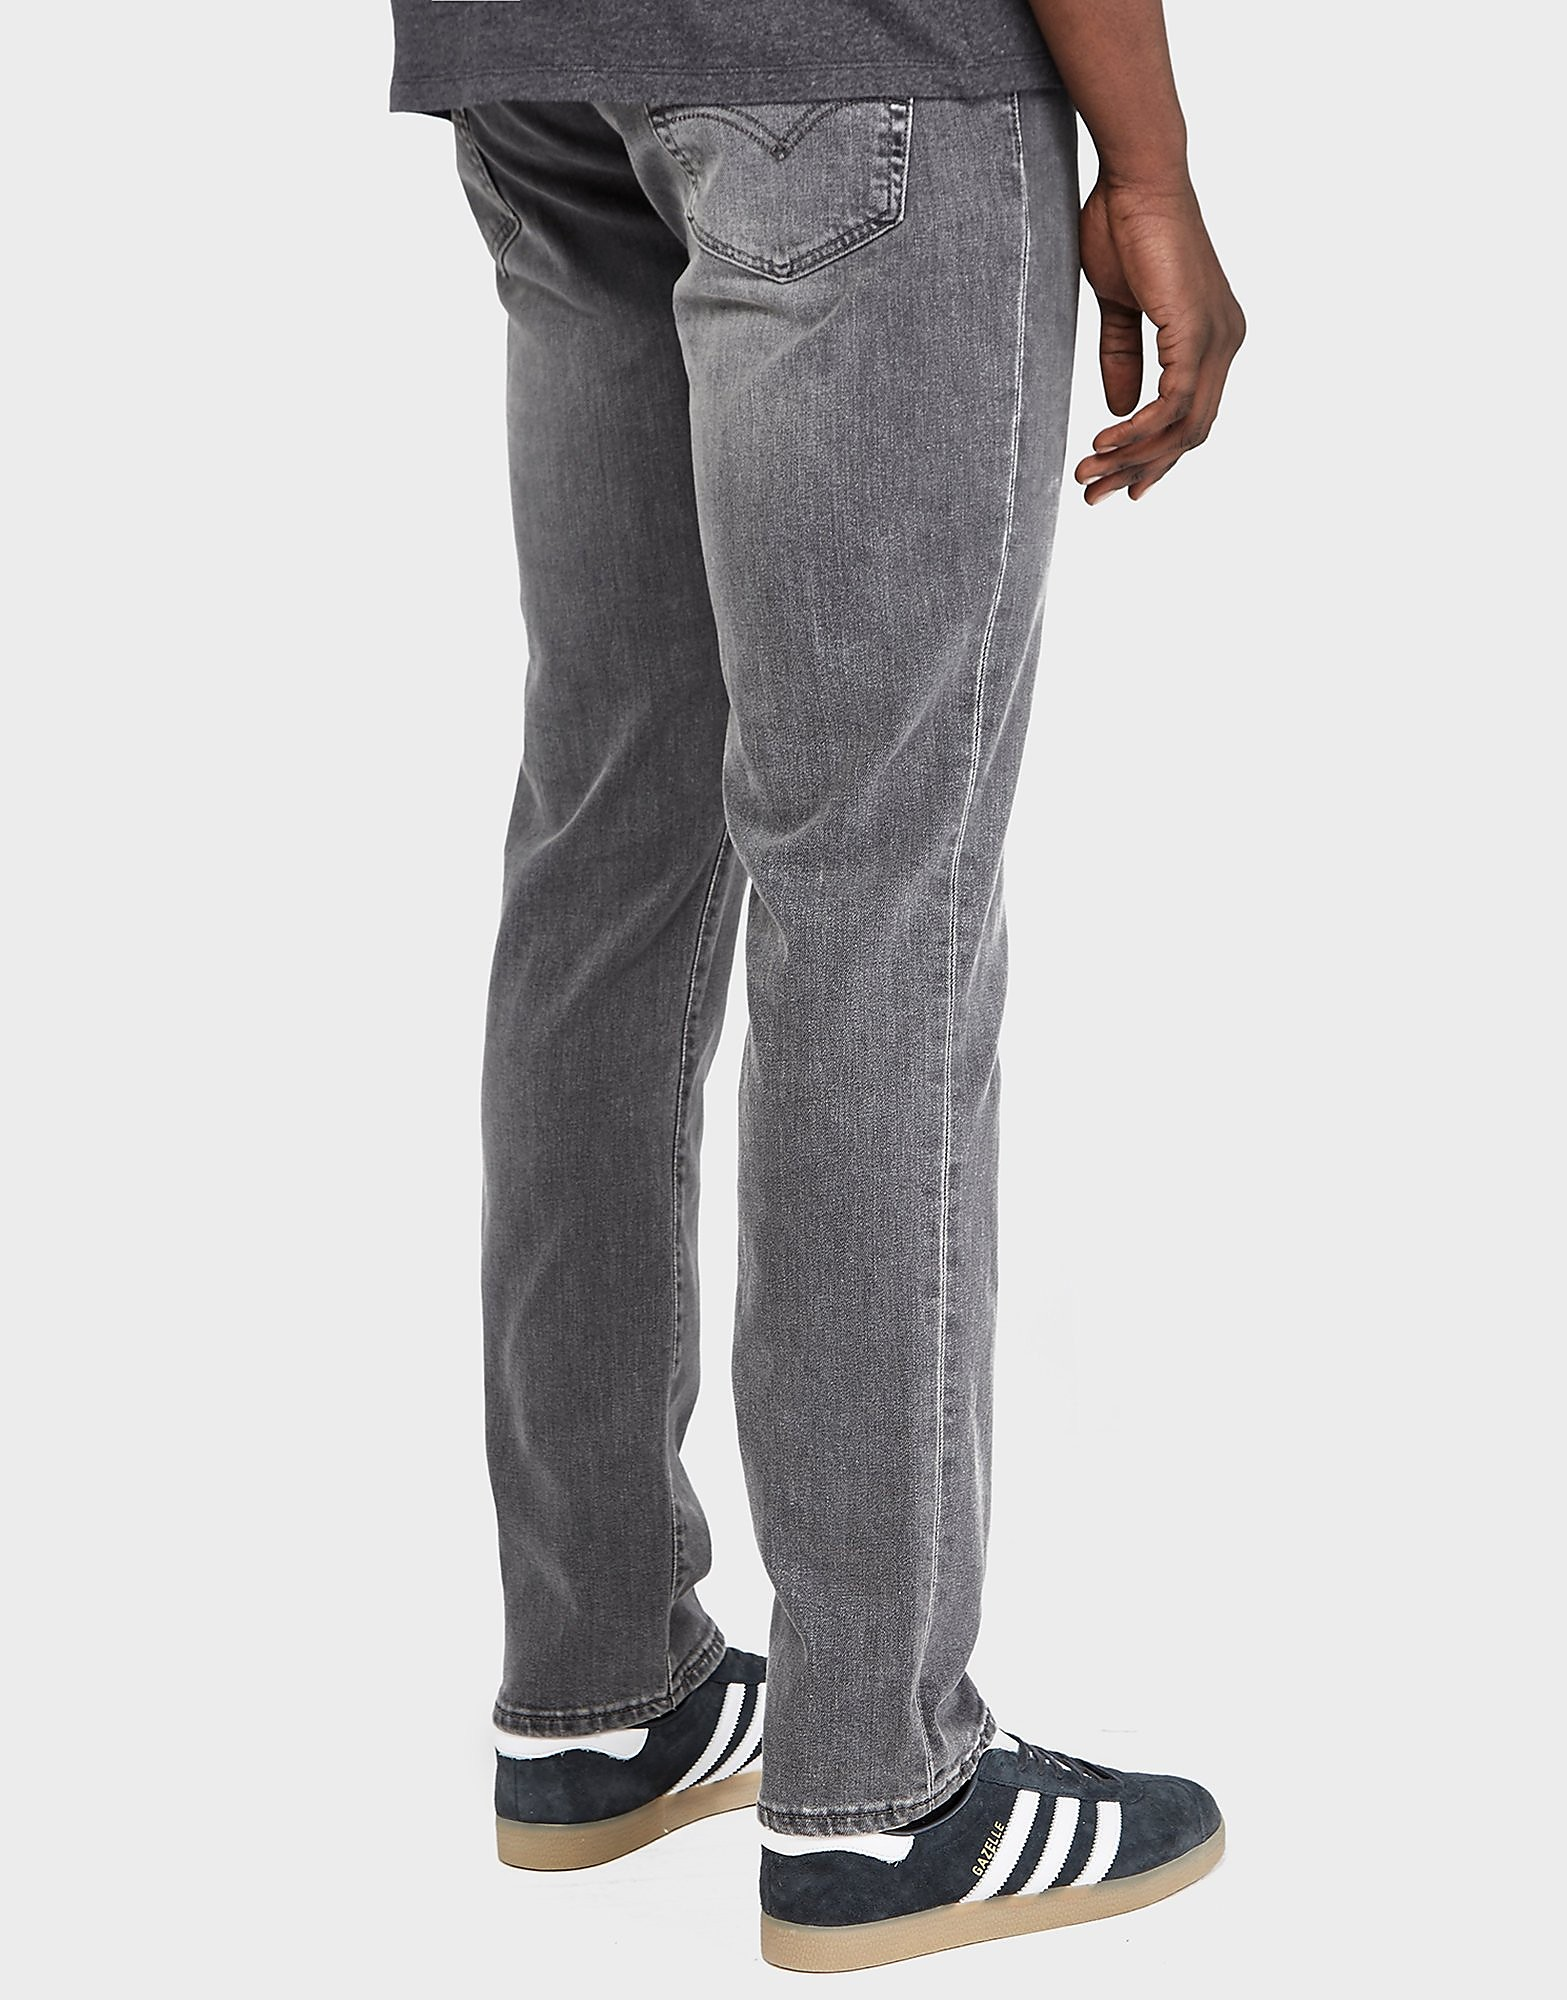 Levis 511 Berry Hill Jeans